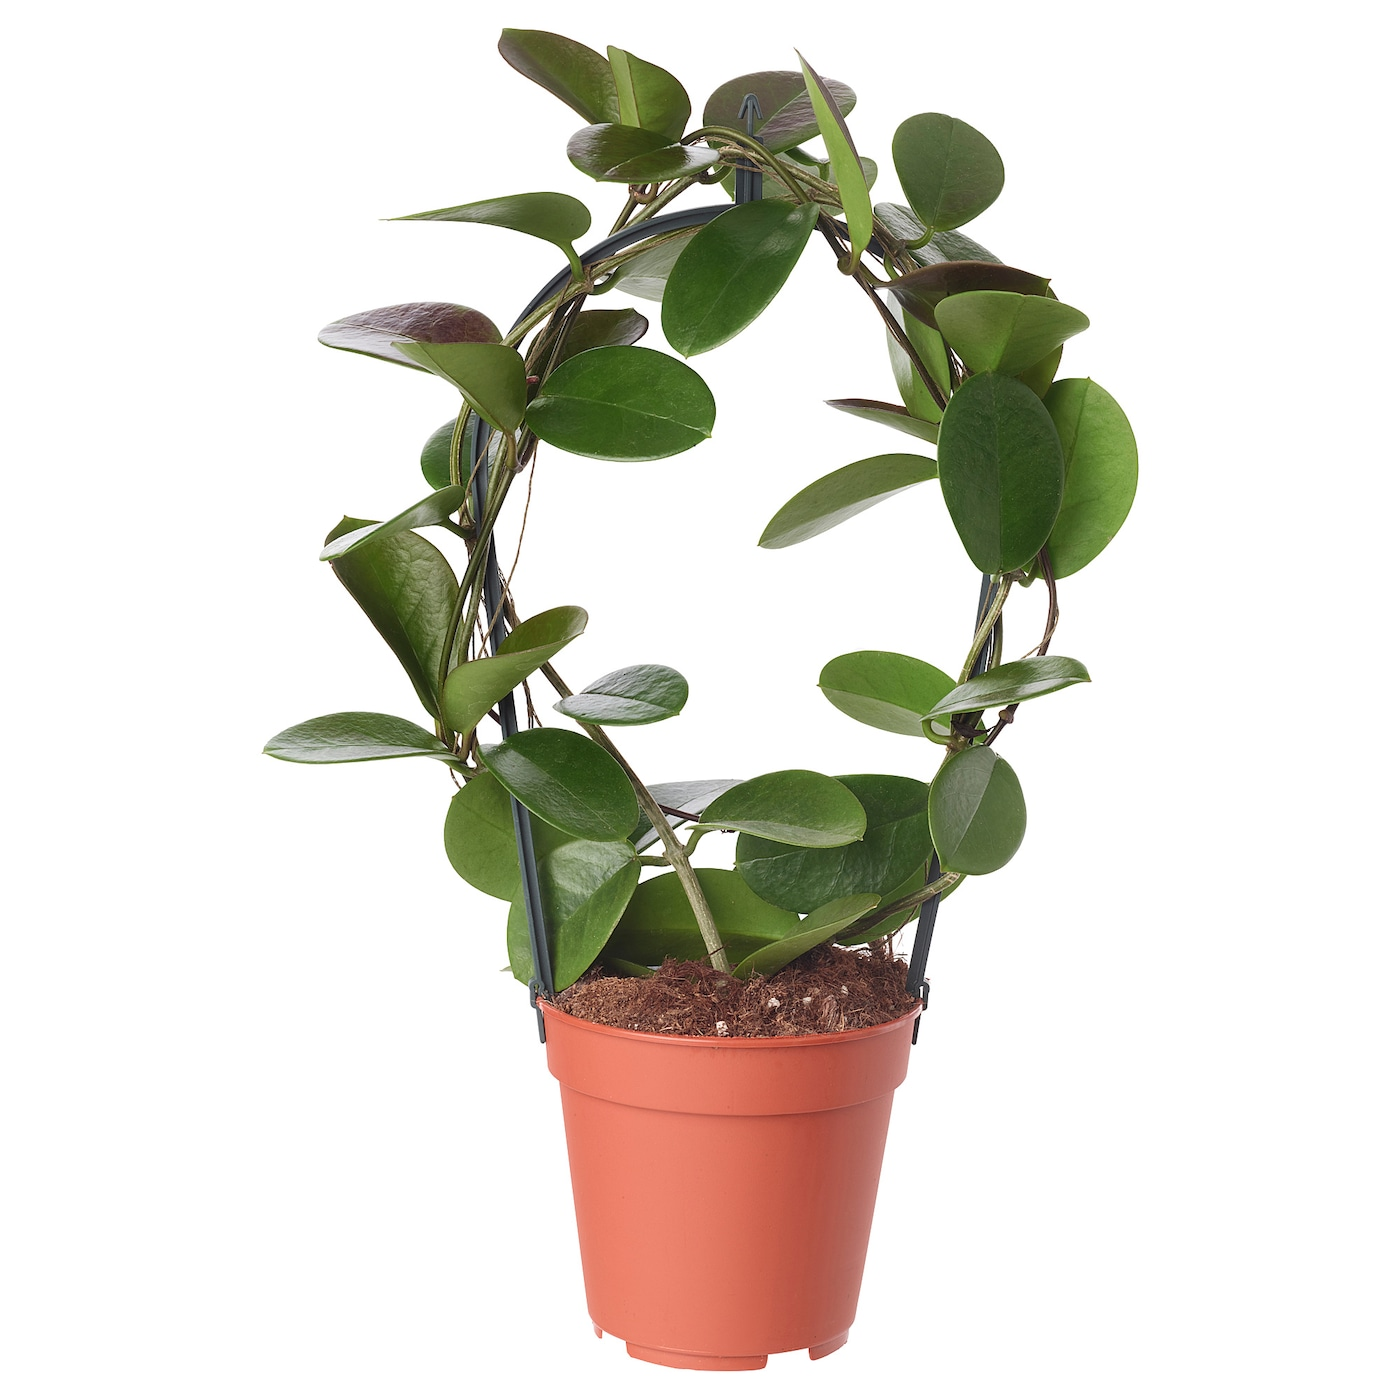 Hoya plante en pot hoyakerrii 12 cm ikea for Commande plante en ligne